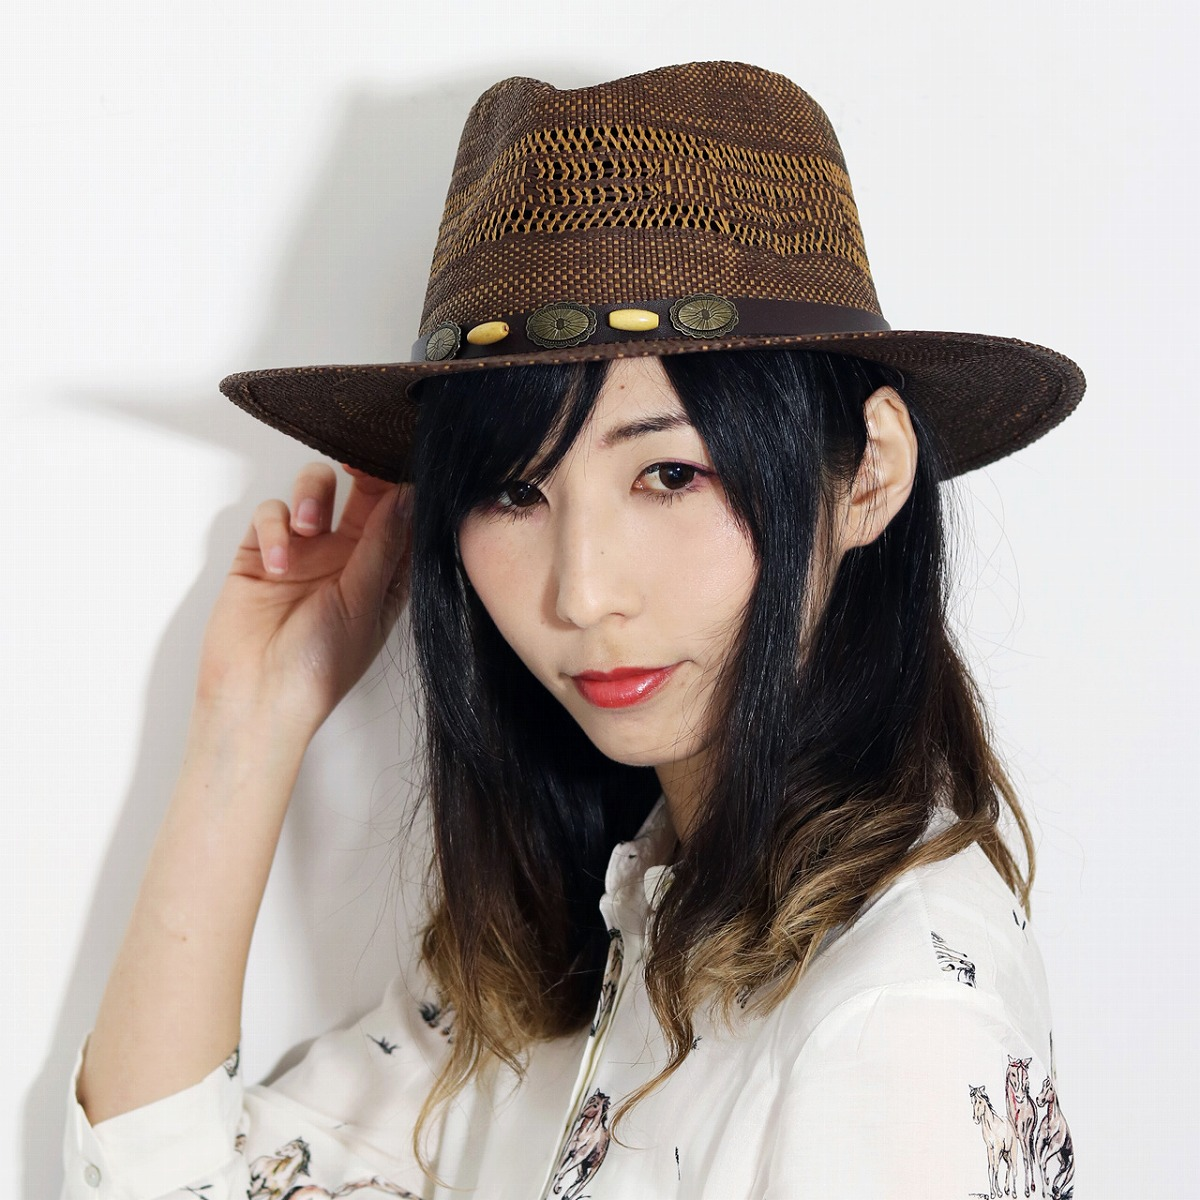 83d5c124e44f55 ELEHELM HAT STORE: The unisex gift present straw hat soft felt hat hat  paper men gap Dis hat ドーフマン DORFMAN PACIFIC [straw hat] tea brown that straw  hat ...